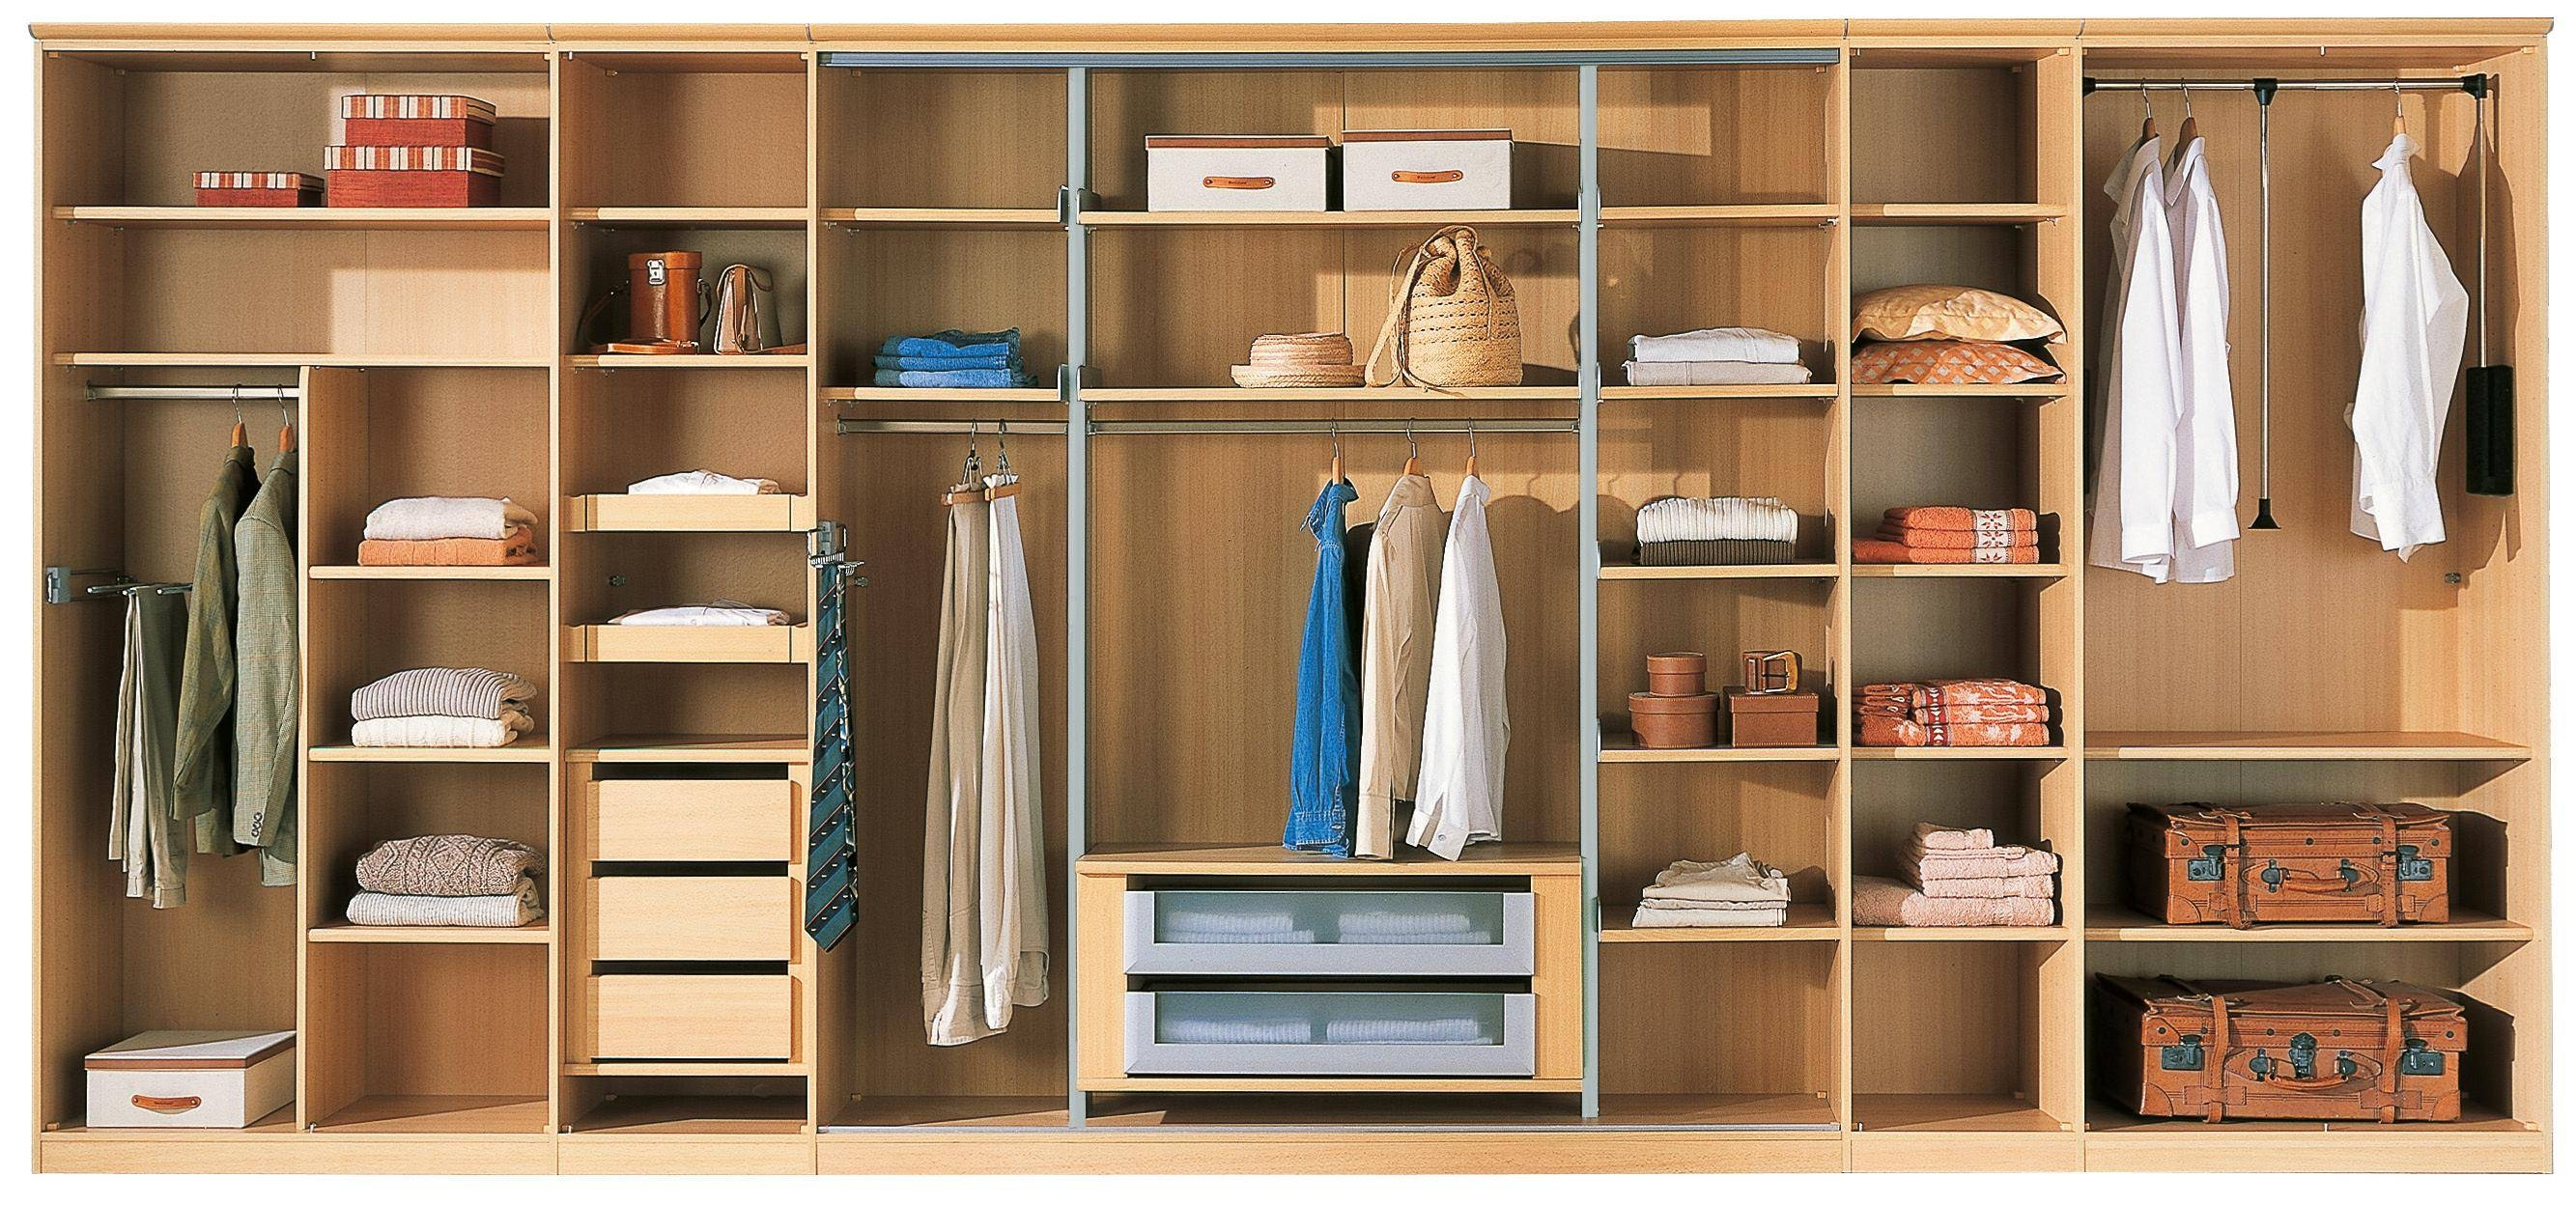 Wardrobe With Storage, Rubbermaid Wardrobe Clothing Wardrobe throughout Wardrobe With Drawers And Shelves (Image 24 of 30)